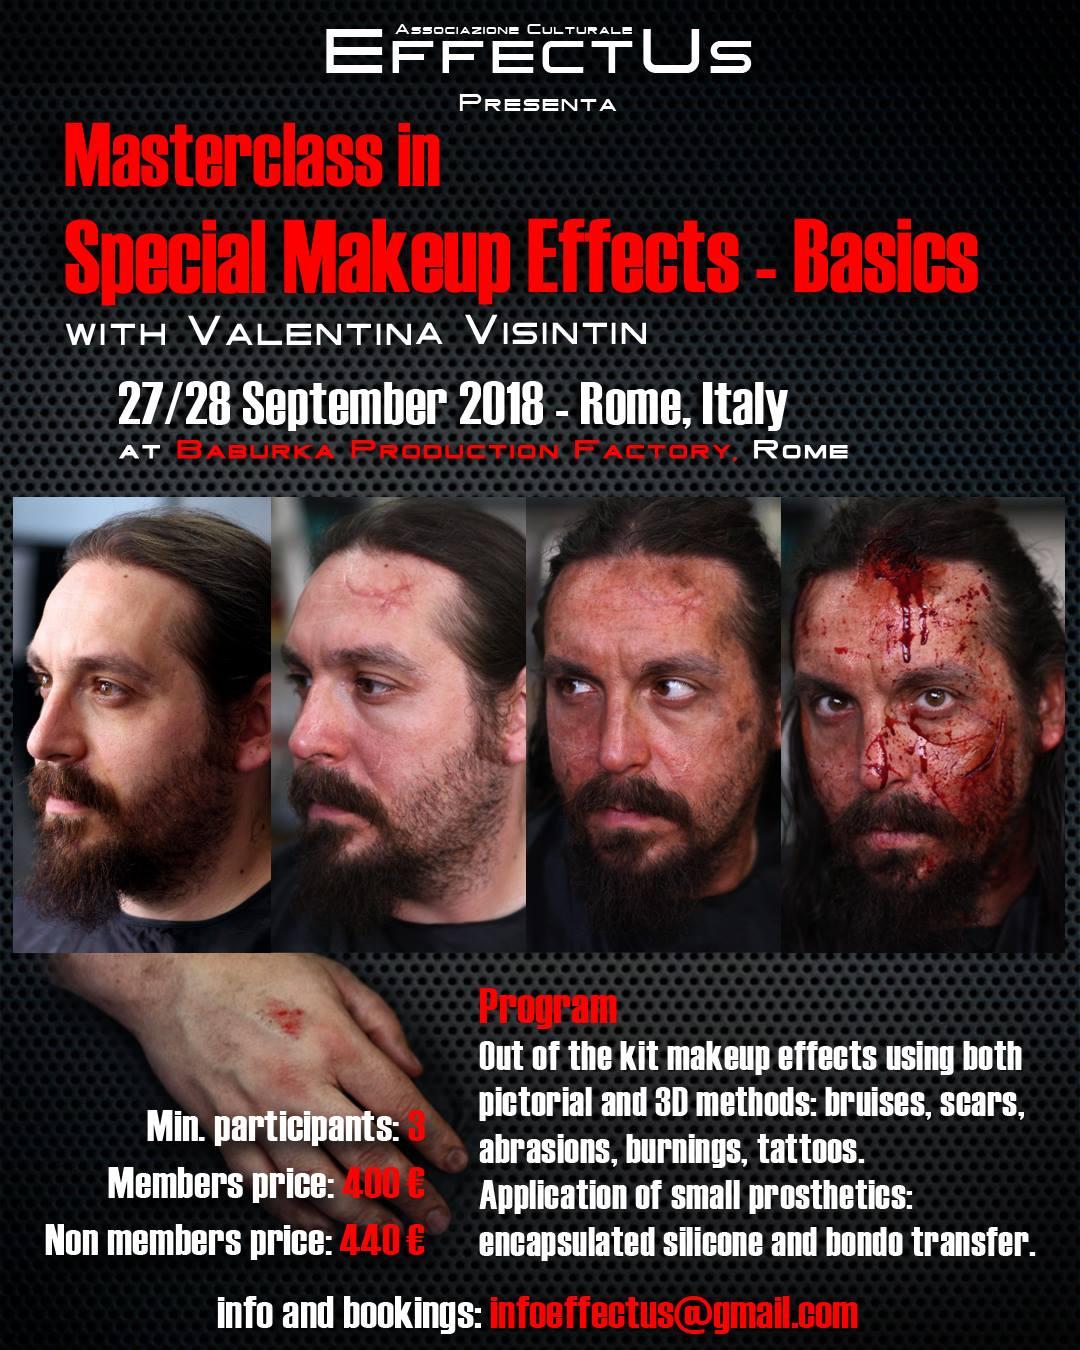 Cultural Association EffectUs - EffectUs Event - Masterclass